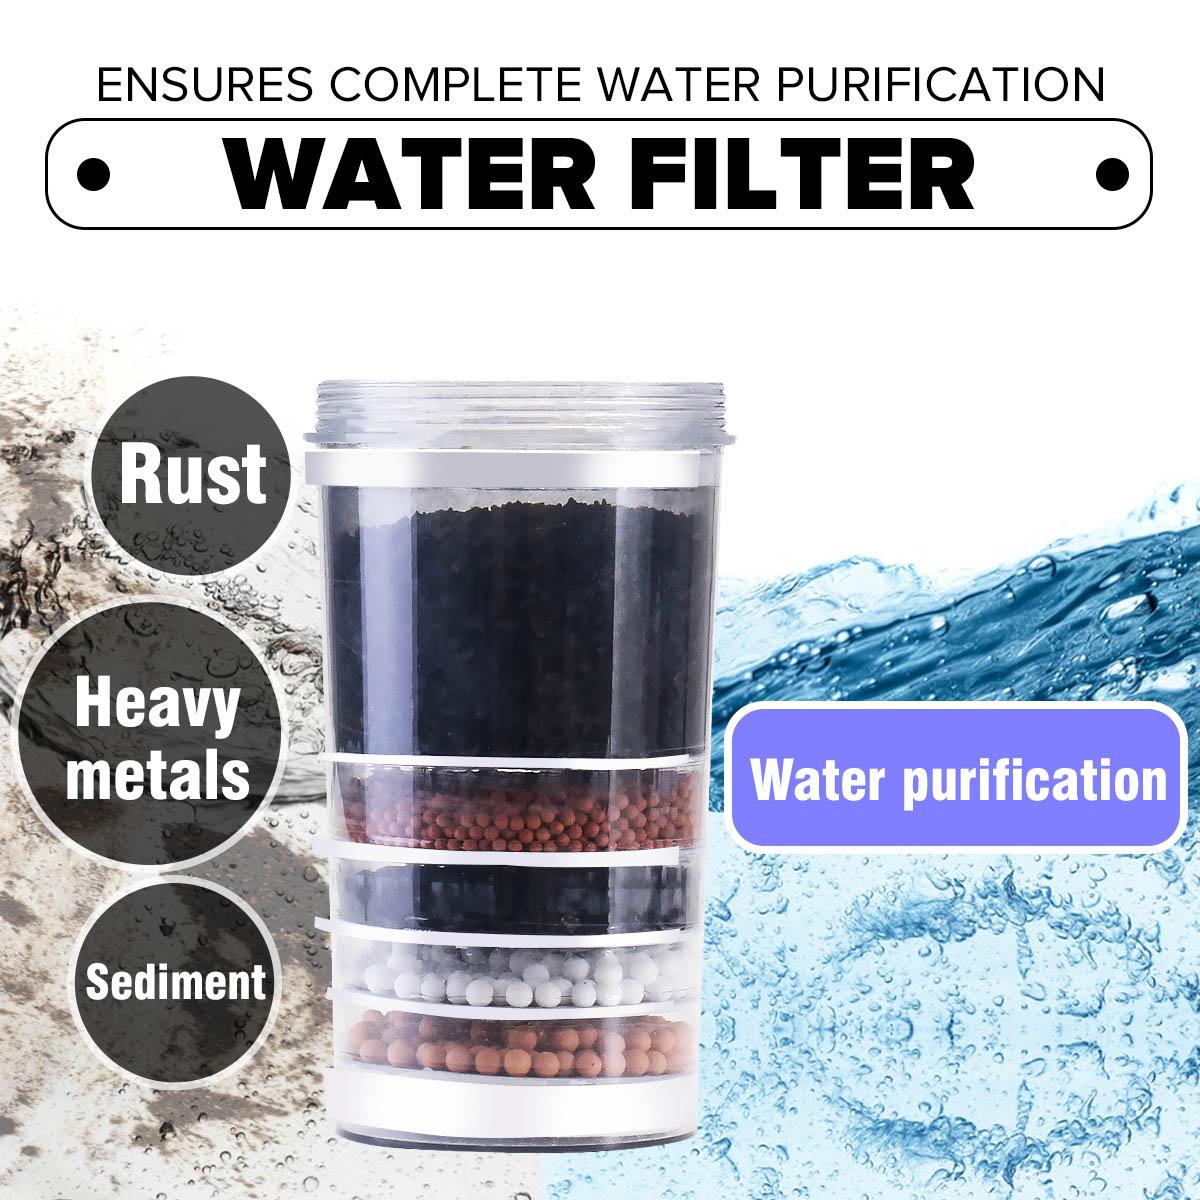 Filtro de agua purificador cerámica superior carbón activado dispensador de minerales reemplazo cartucho cocina accesorios para grifos